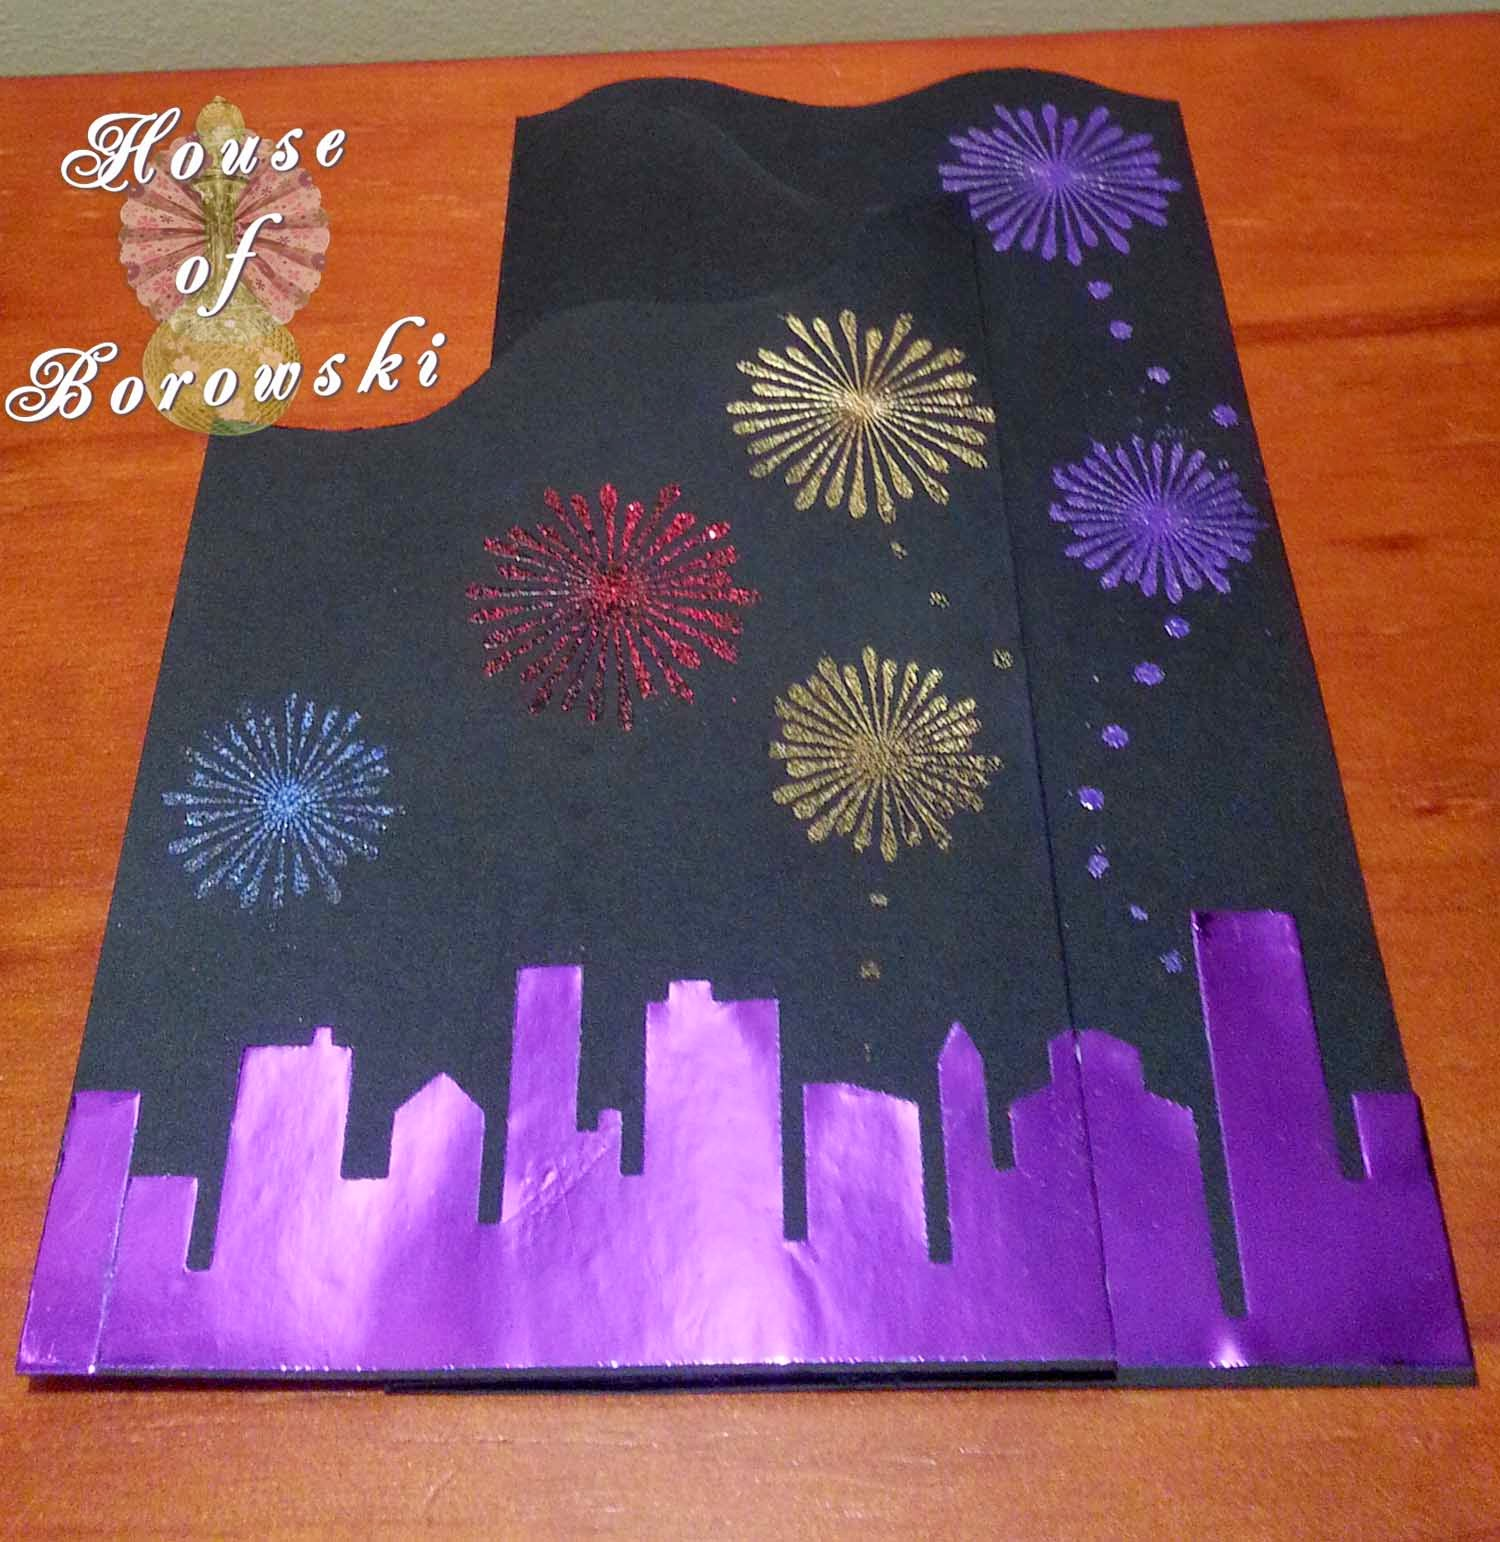 House of Borowski, memory box cityscape silhouette, Cuttlebug, allison ellis design, judikins, Gina K Design Stamp, DCWR,